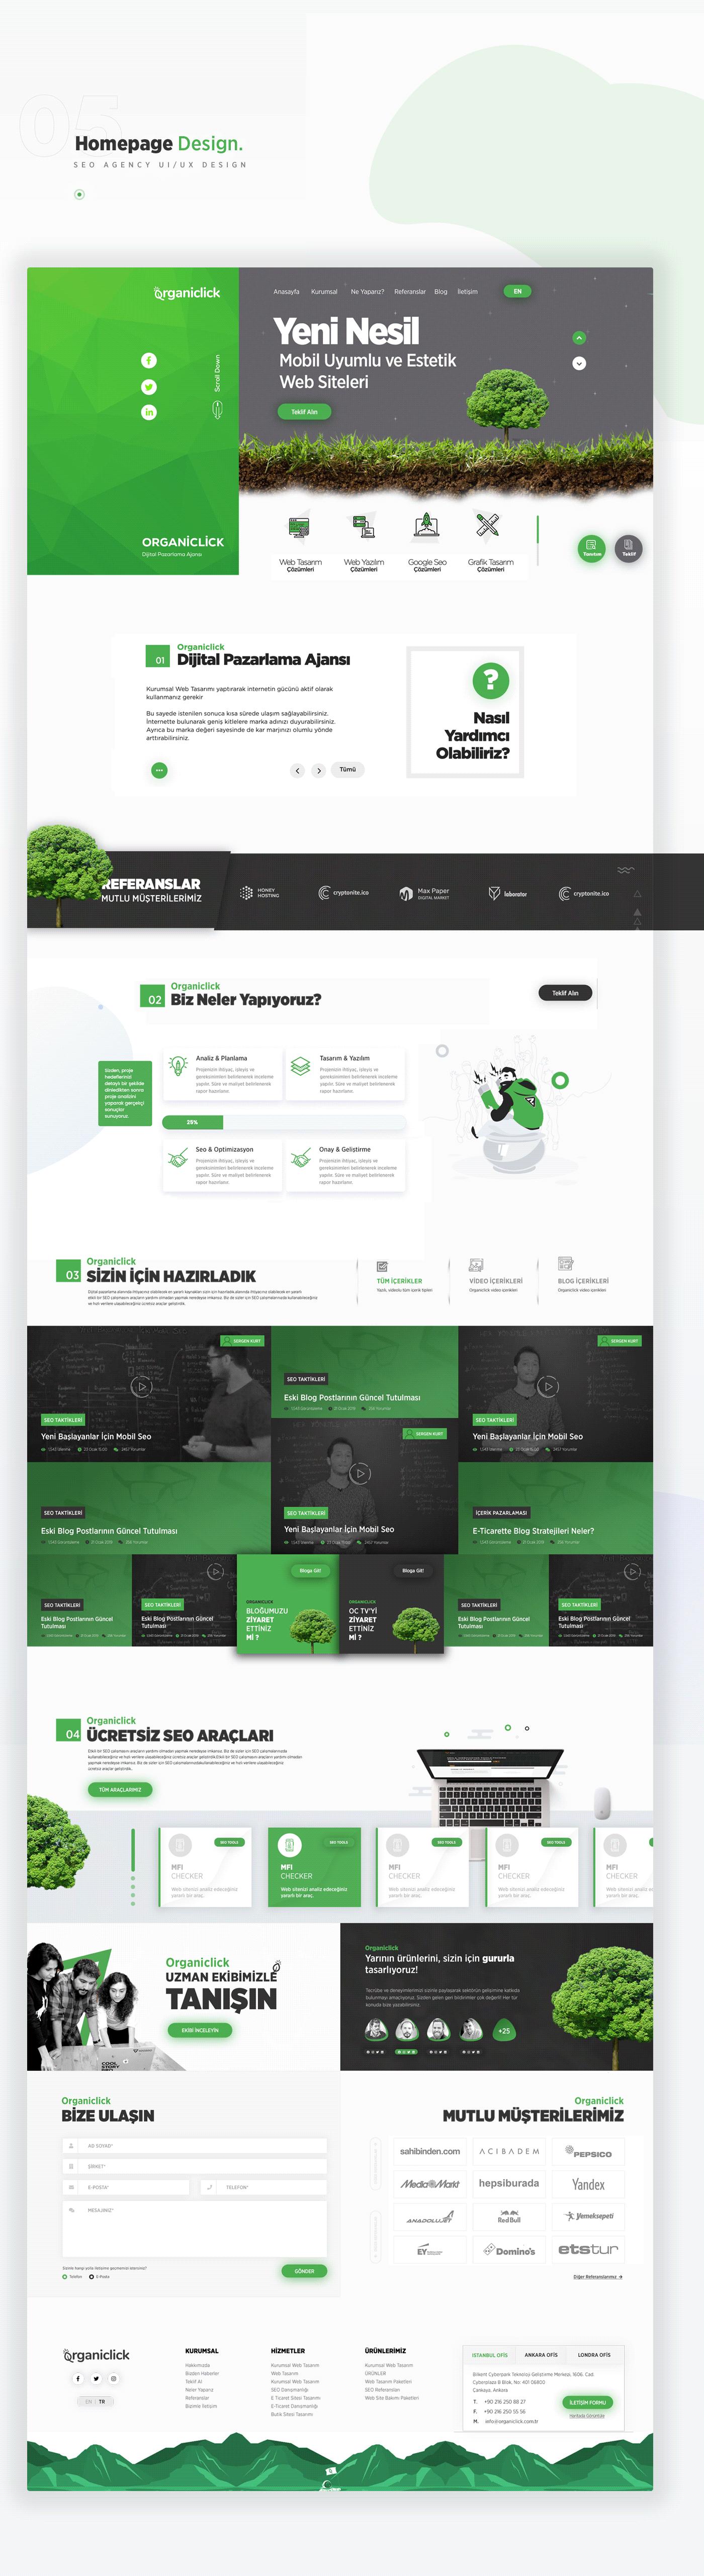 design Interface SEO seo agency UI/UX Web Design